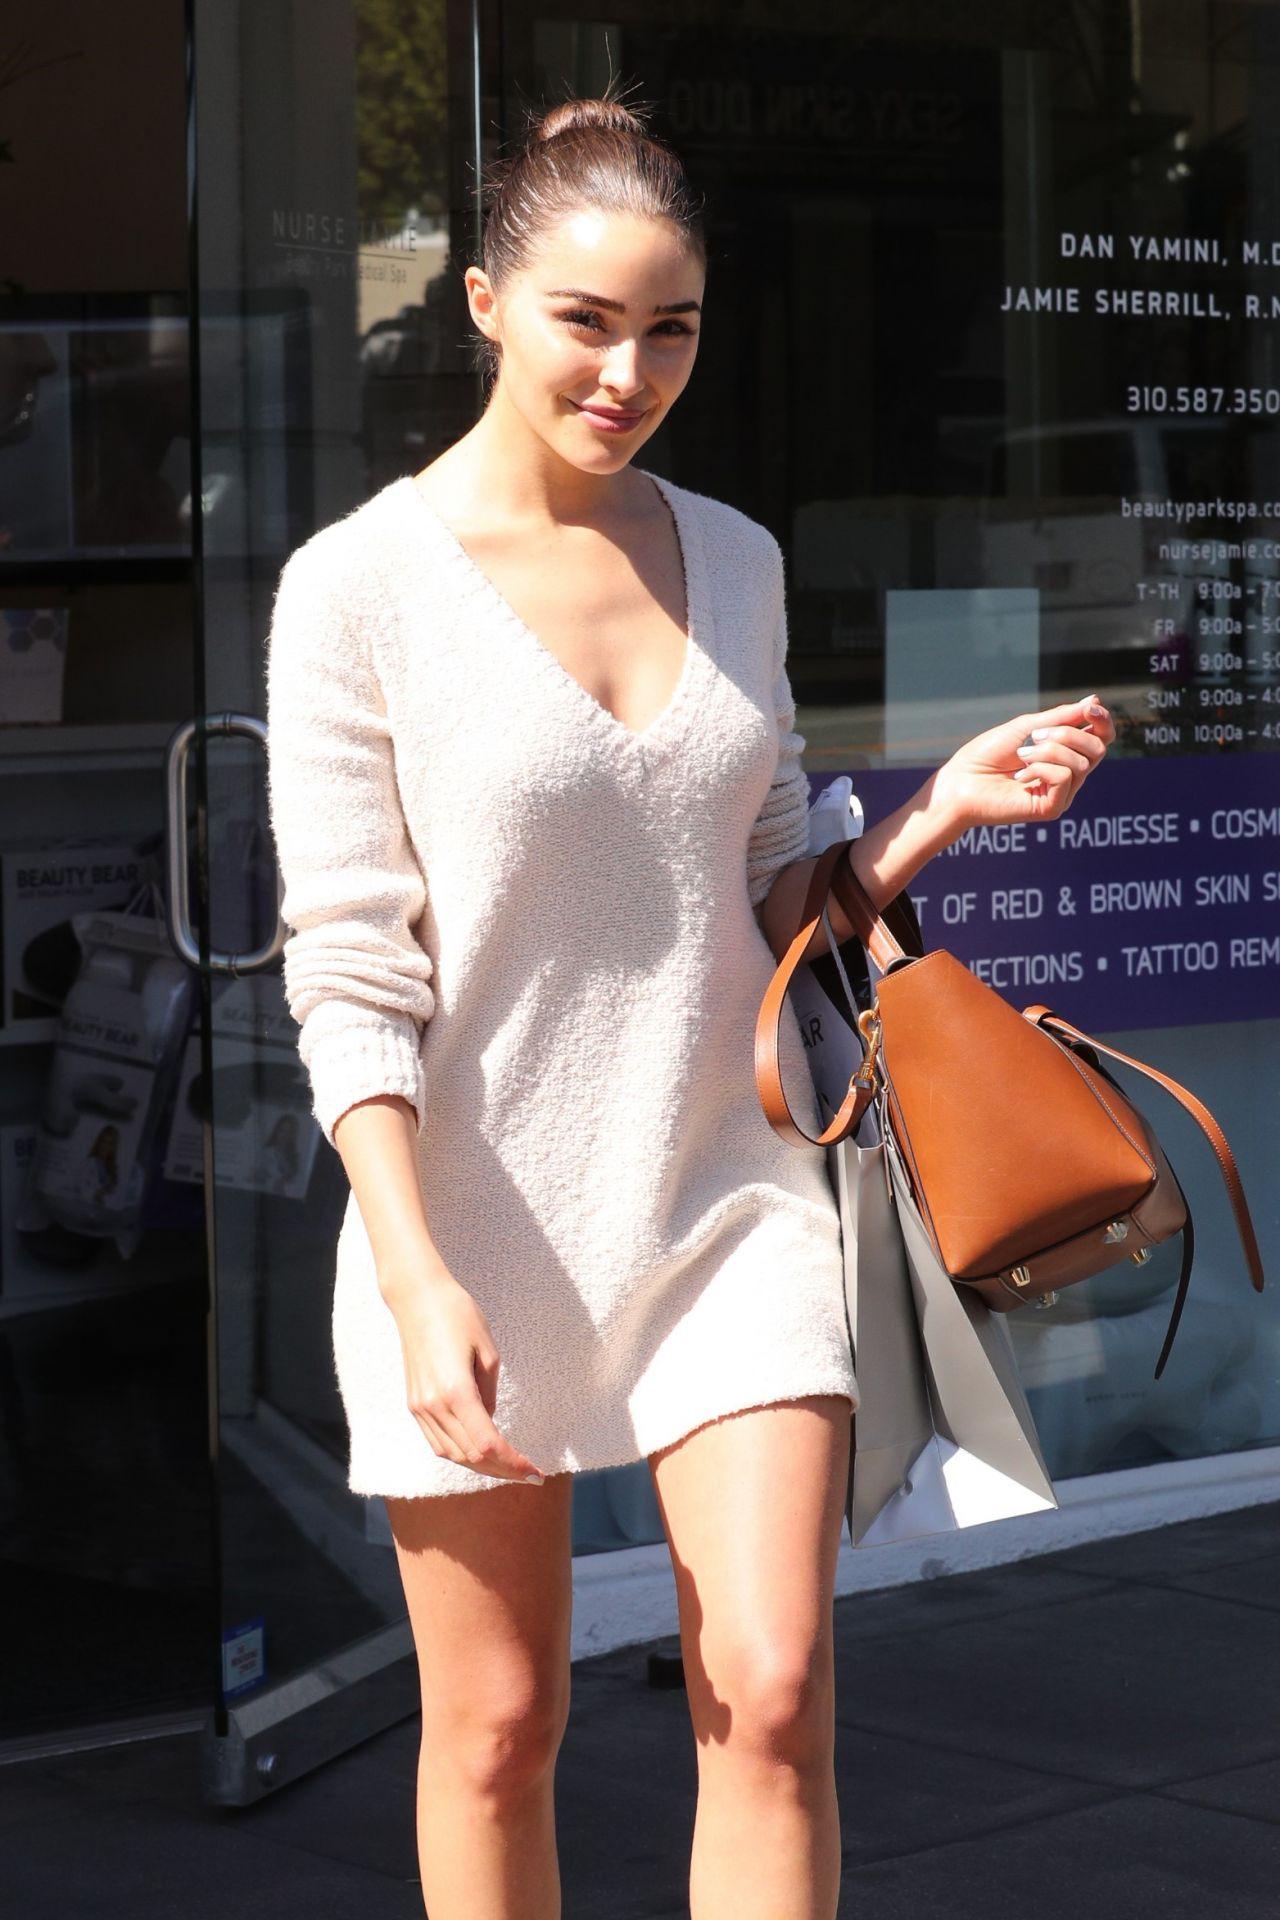 Olivia culpo shows off her legs leaving nurse jaime beauty salon in santa monica nude (51 photo), Pussy Celebrites images